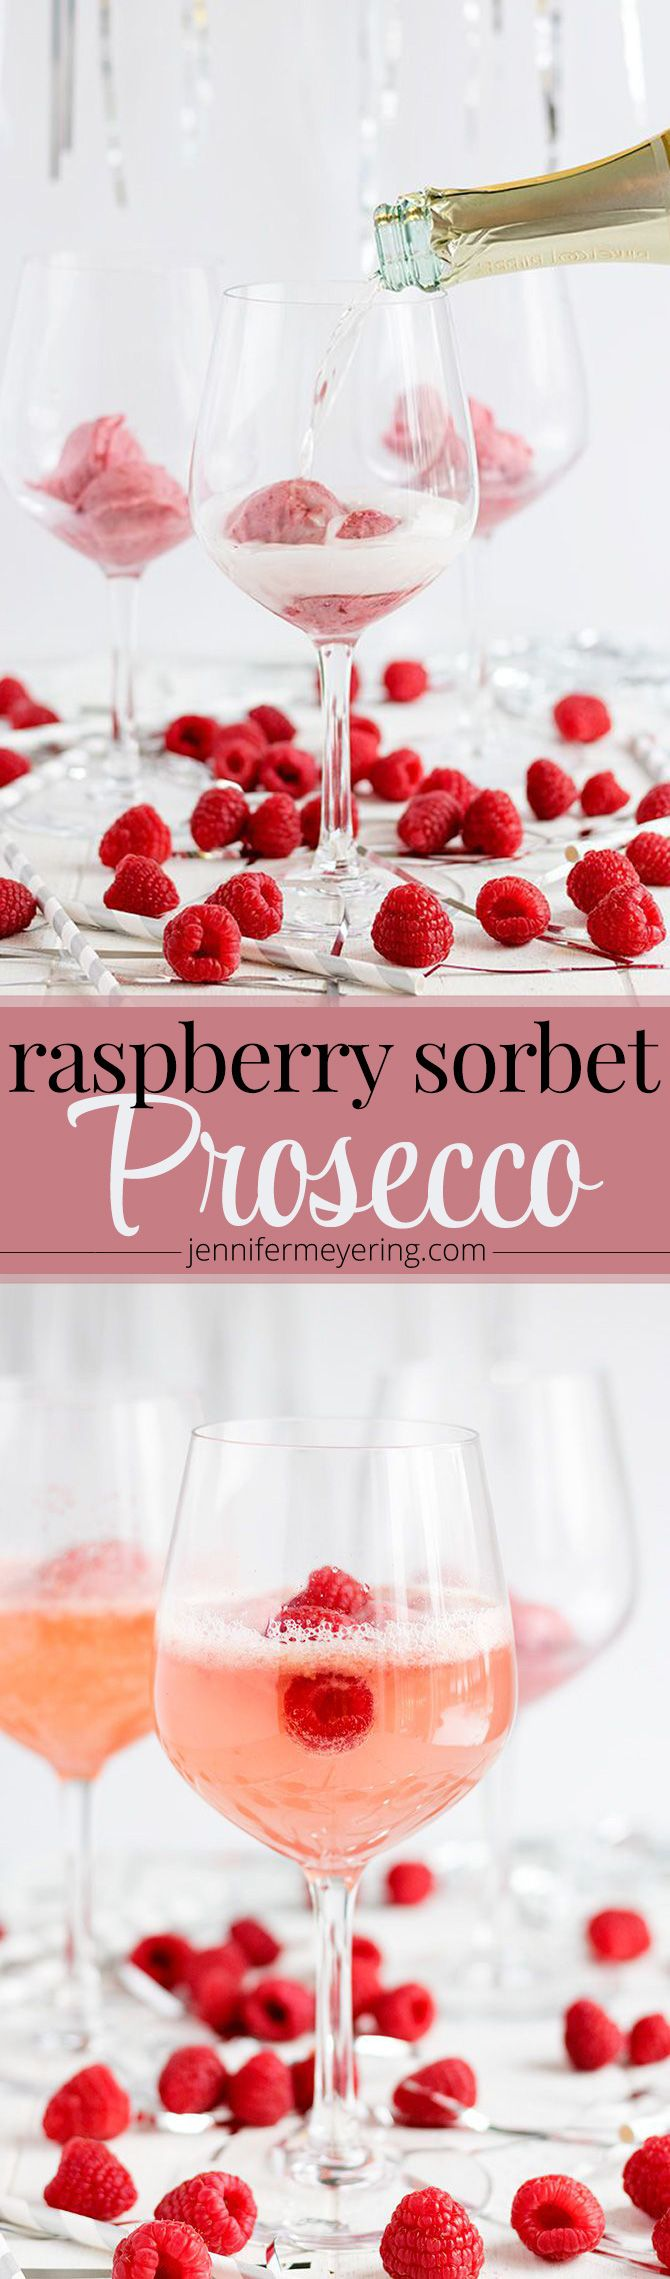 Raspberry Sorbet Prosecco - JenniferMeyering.com